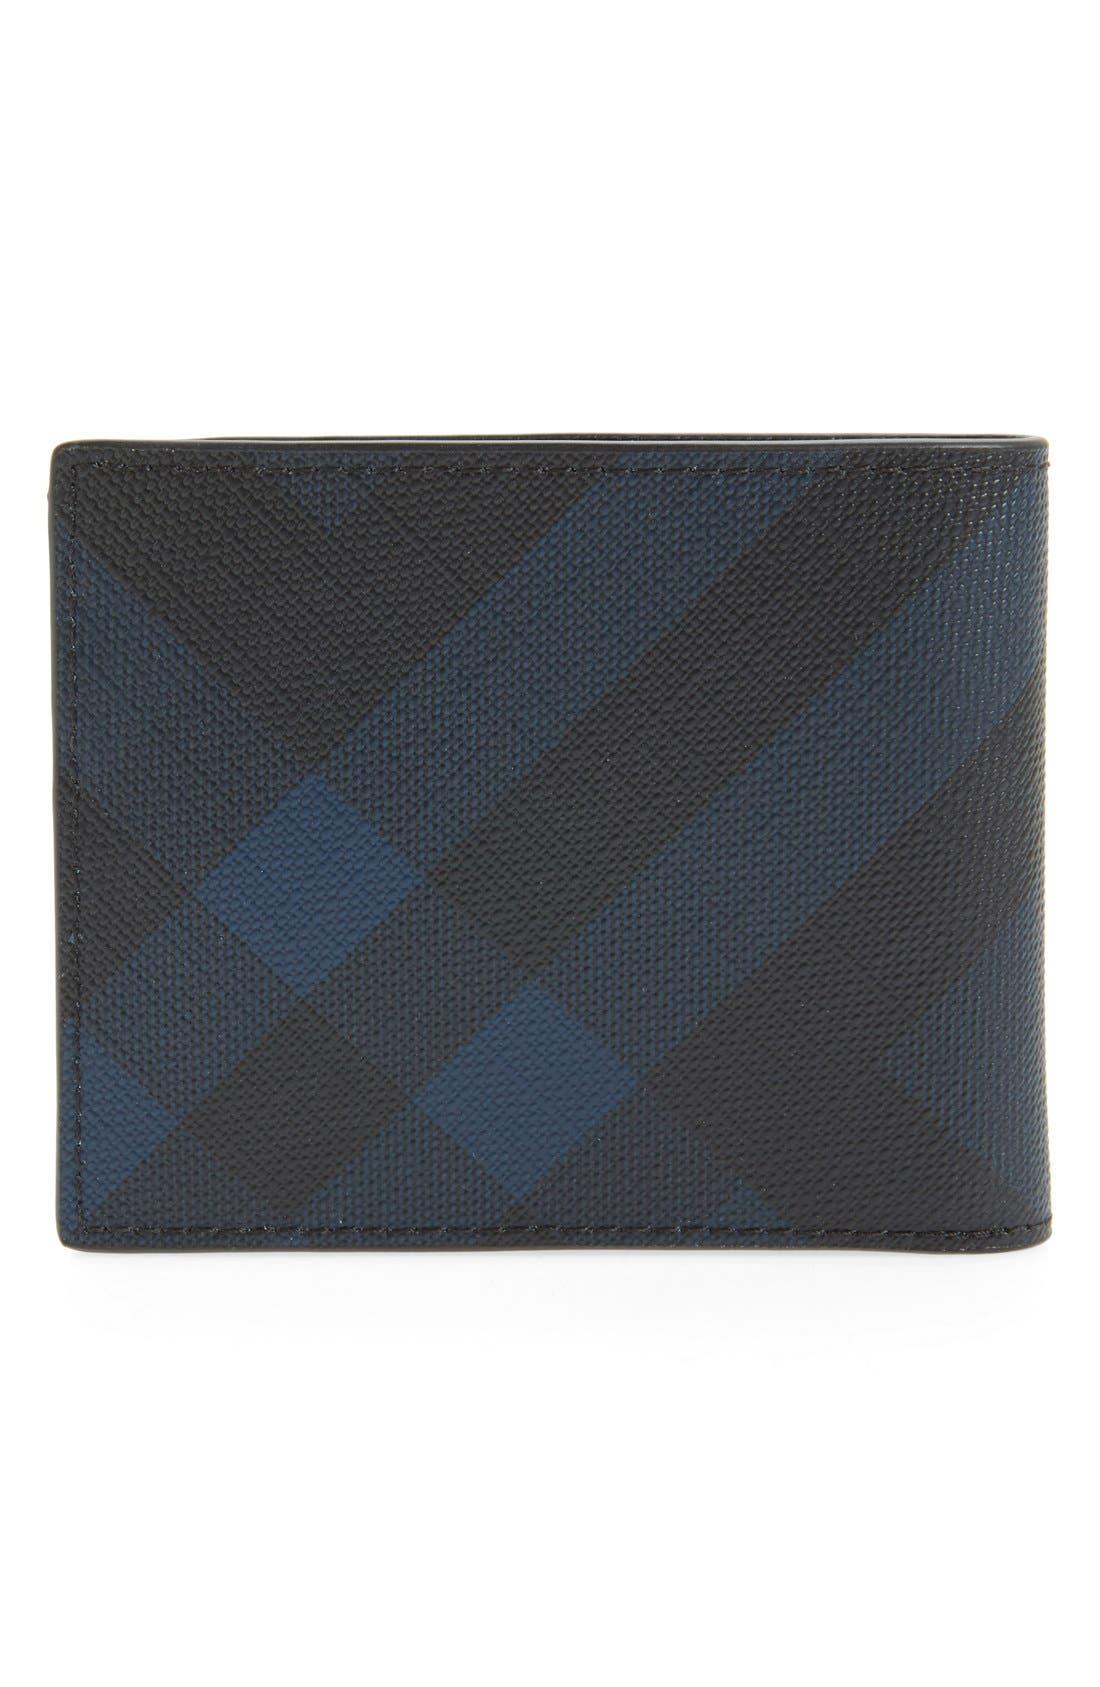 Check Wallet,                             Alternate thumbnail 2, color,                             NAVY/ BLACK